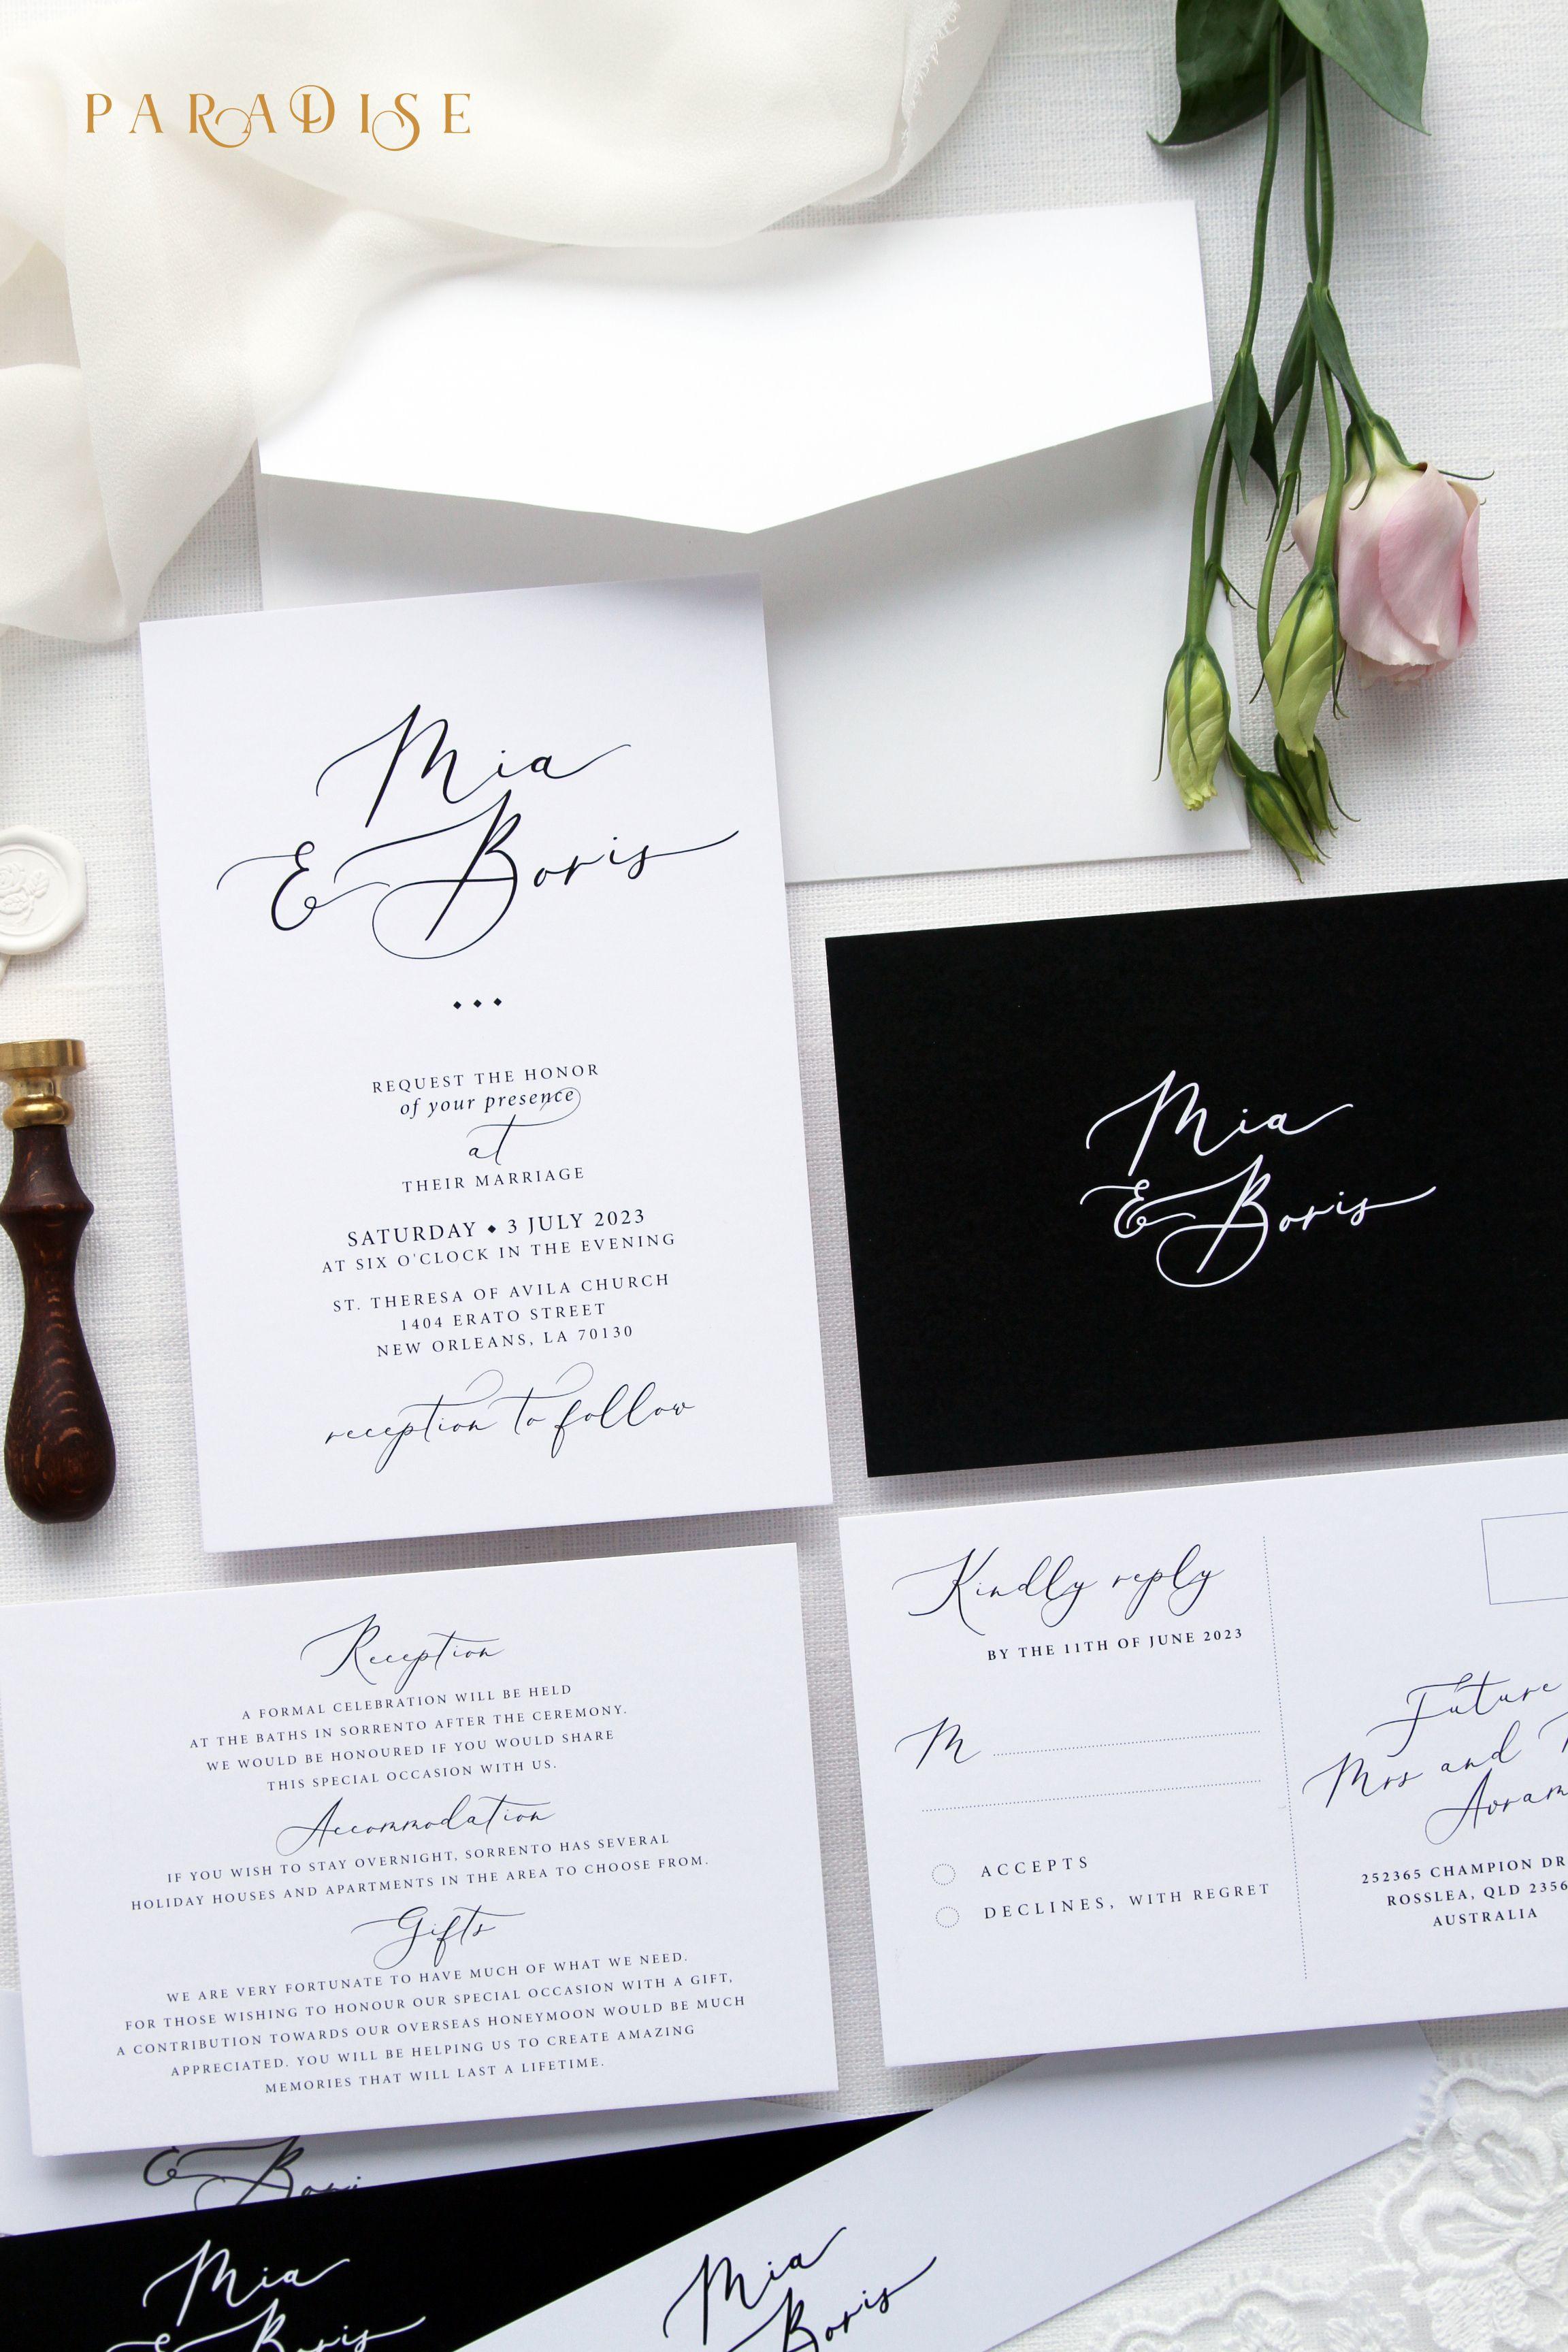 Mila Black and White Wedding Invitation Sets